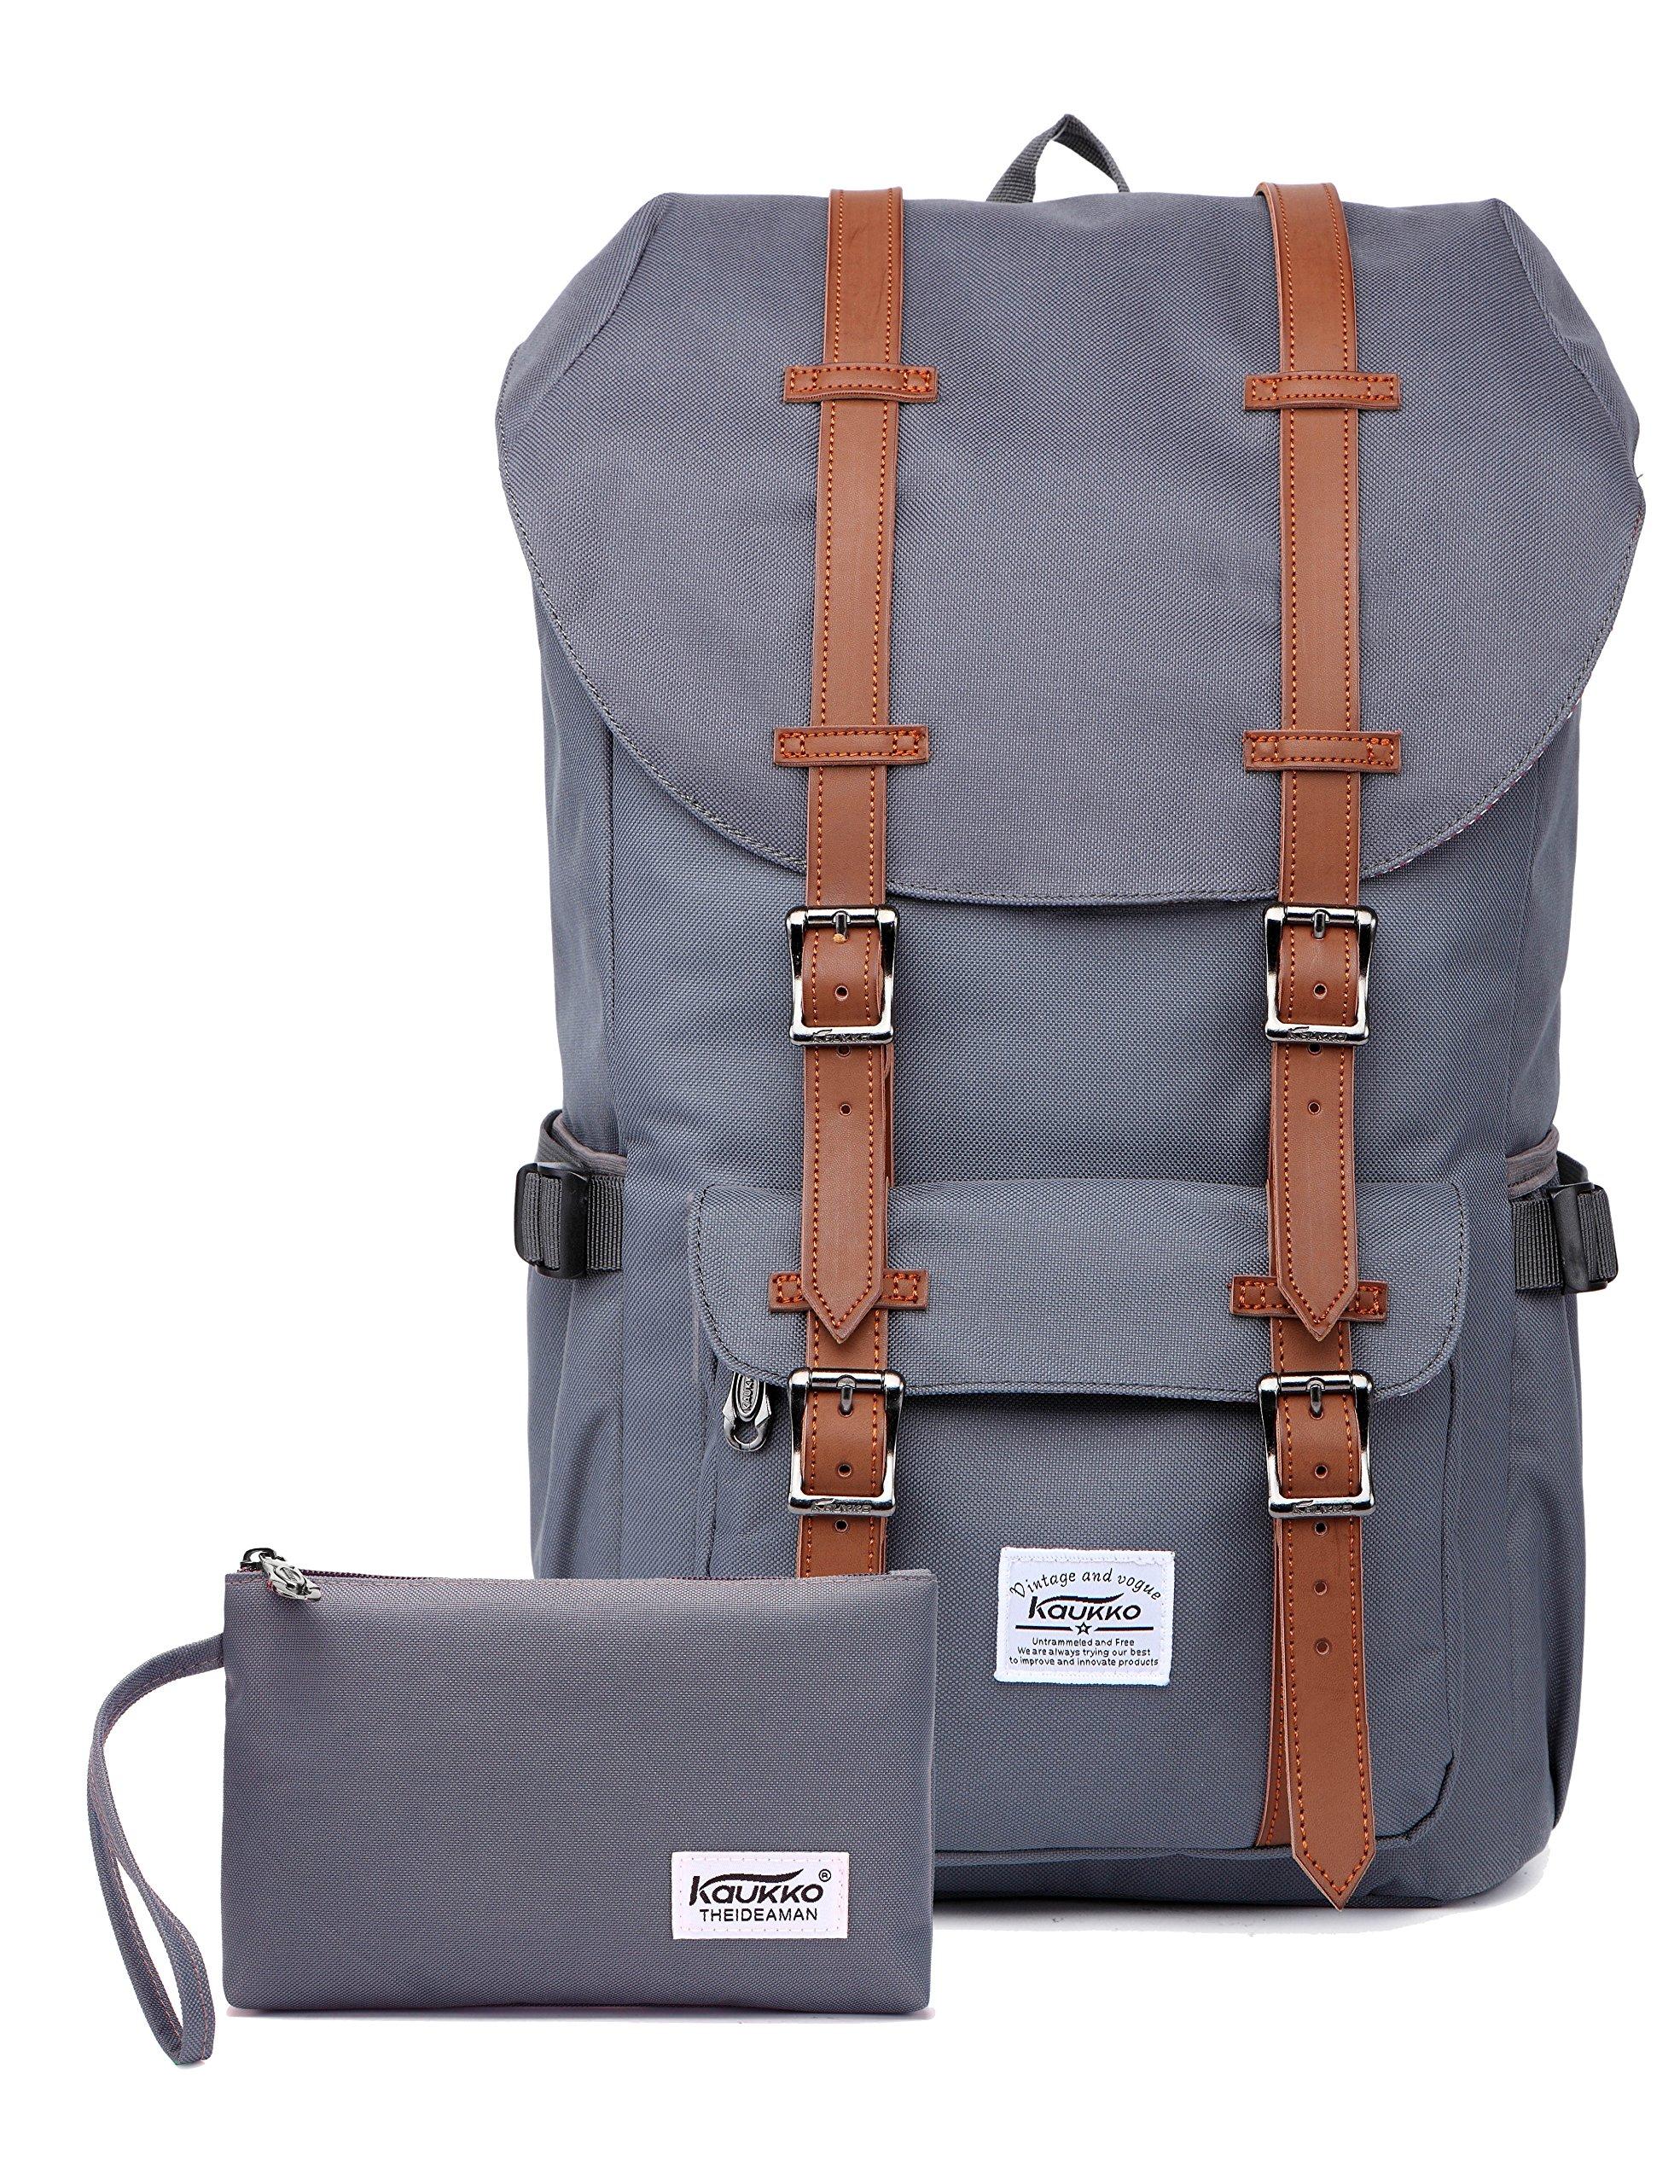 KAUKKO Laptop Outdoor Backpack, Travel Hiking& Camping Rucksack Pack, Casual Large College School Daypack, Shoulder Book Bags Back Fits 15'' Laptop & Tablets (NGrey 2pcs) by KAUKKO